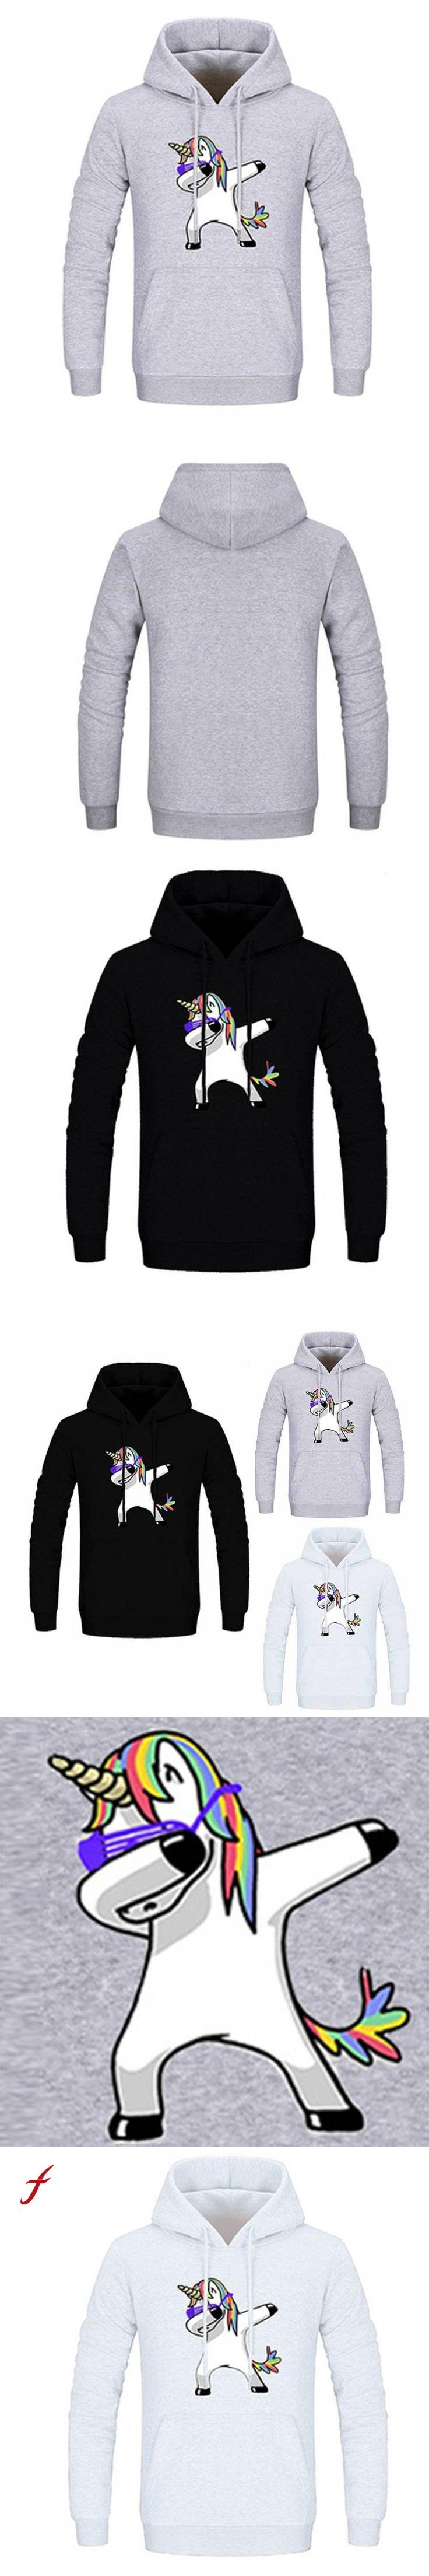 2017 Newly Simple Korean Style winter sweatshirts for Men Unicorn Print Long Sleeve Drawstring Hoodies Pocket jumper Pullover